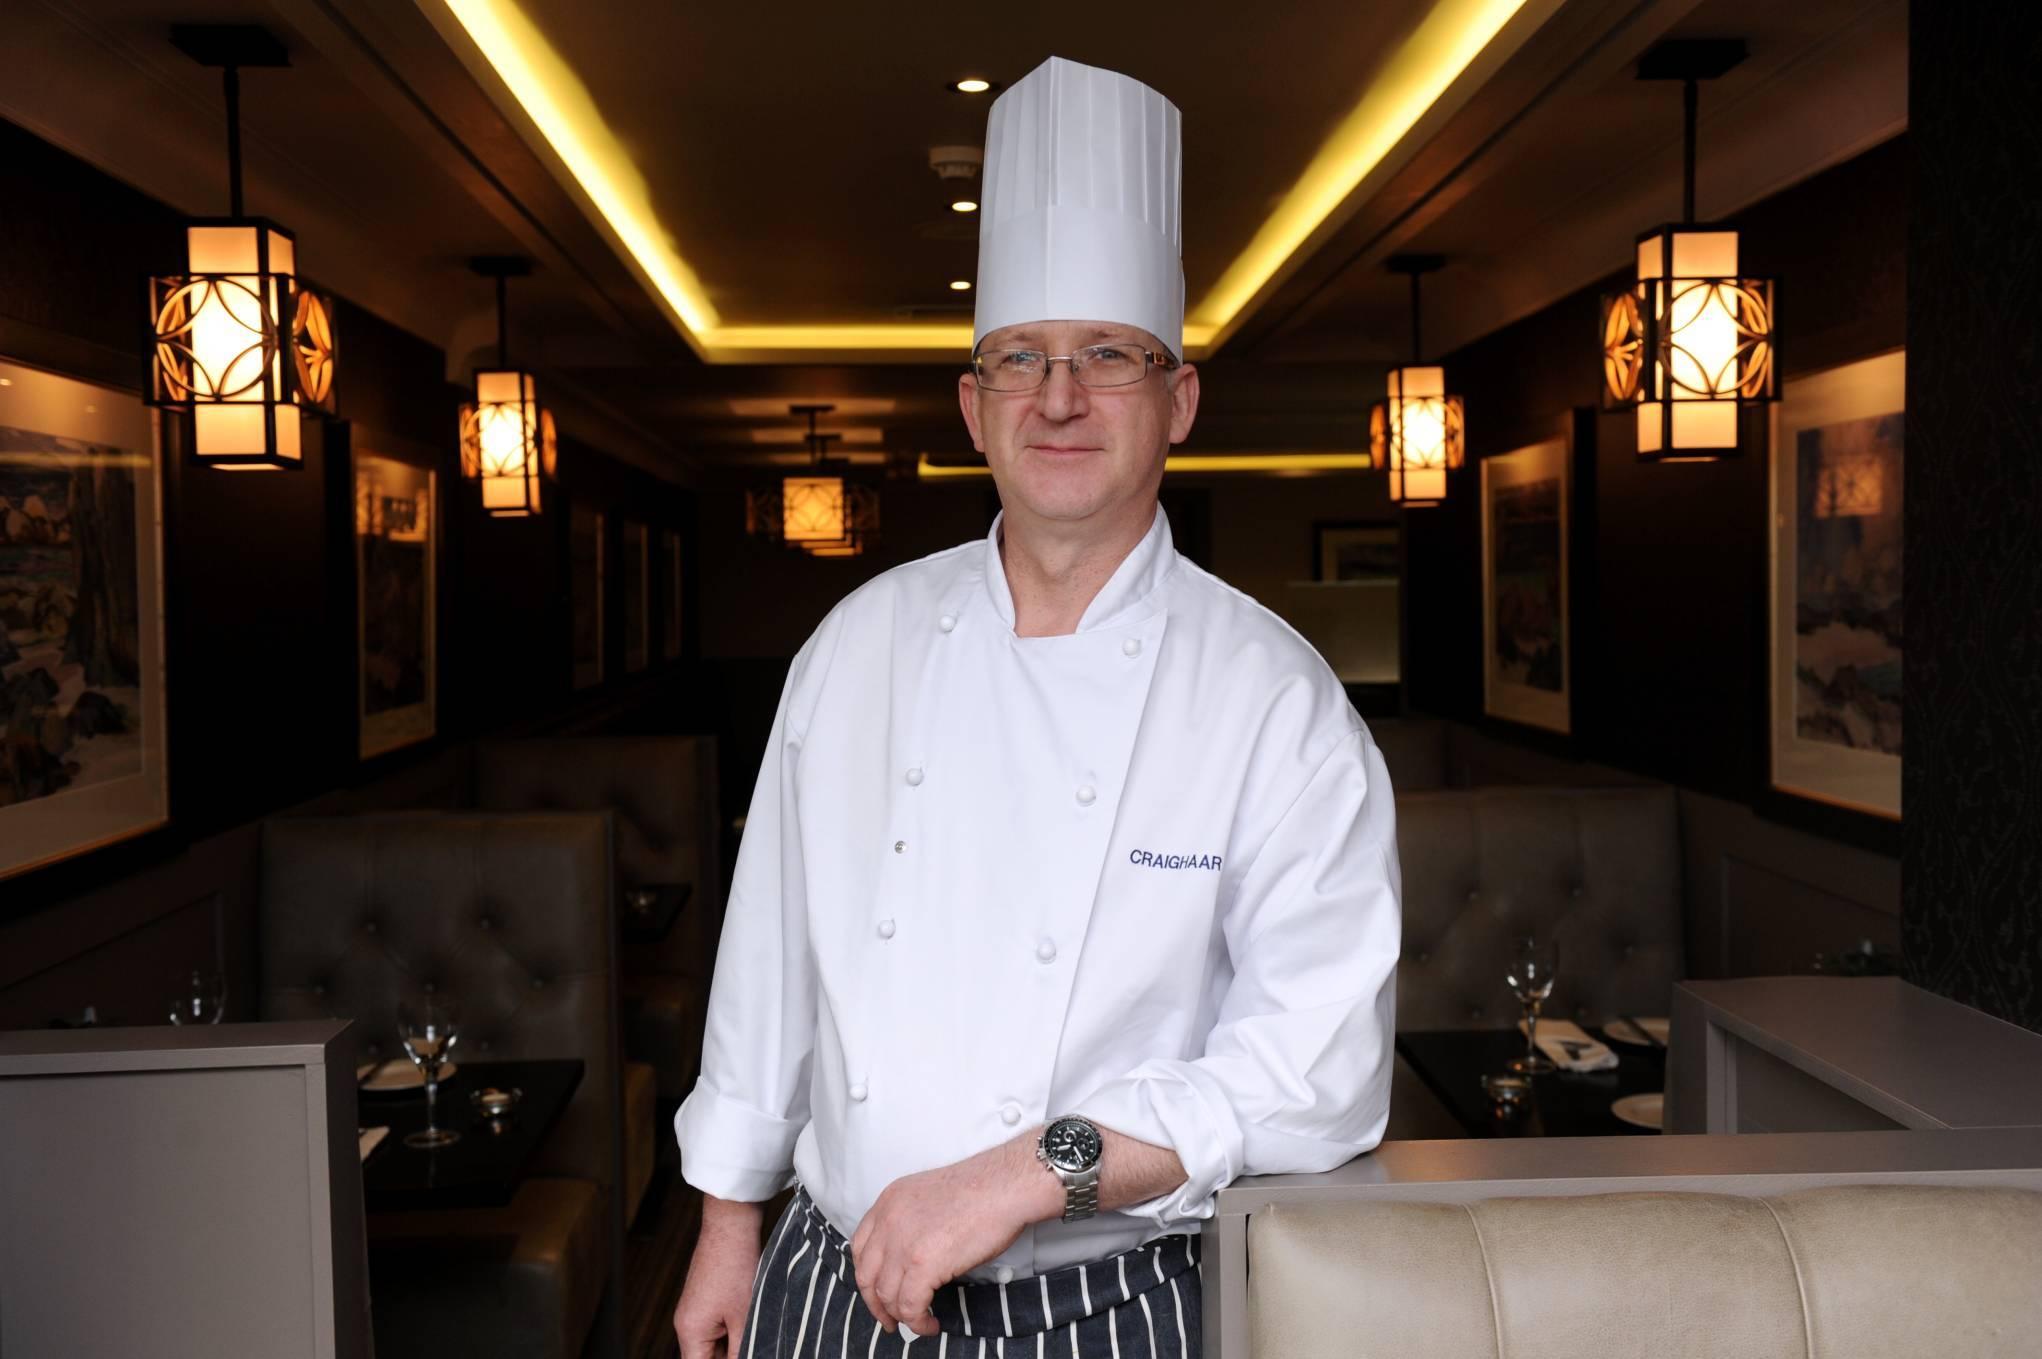 Head Chef Kenny Moir at the Craighaar Hotel.